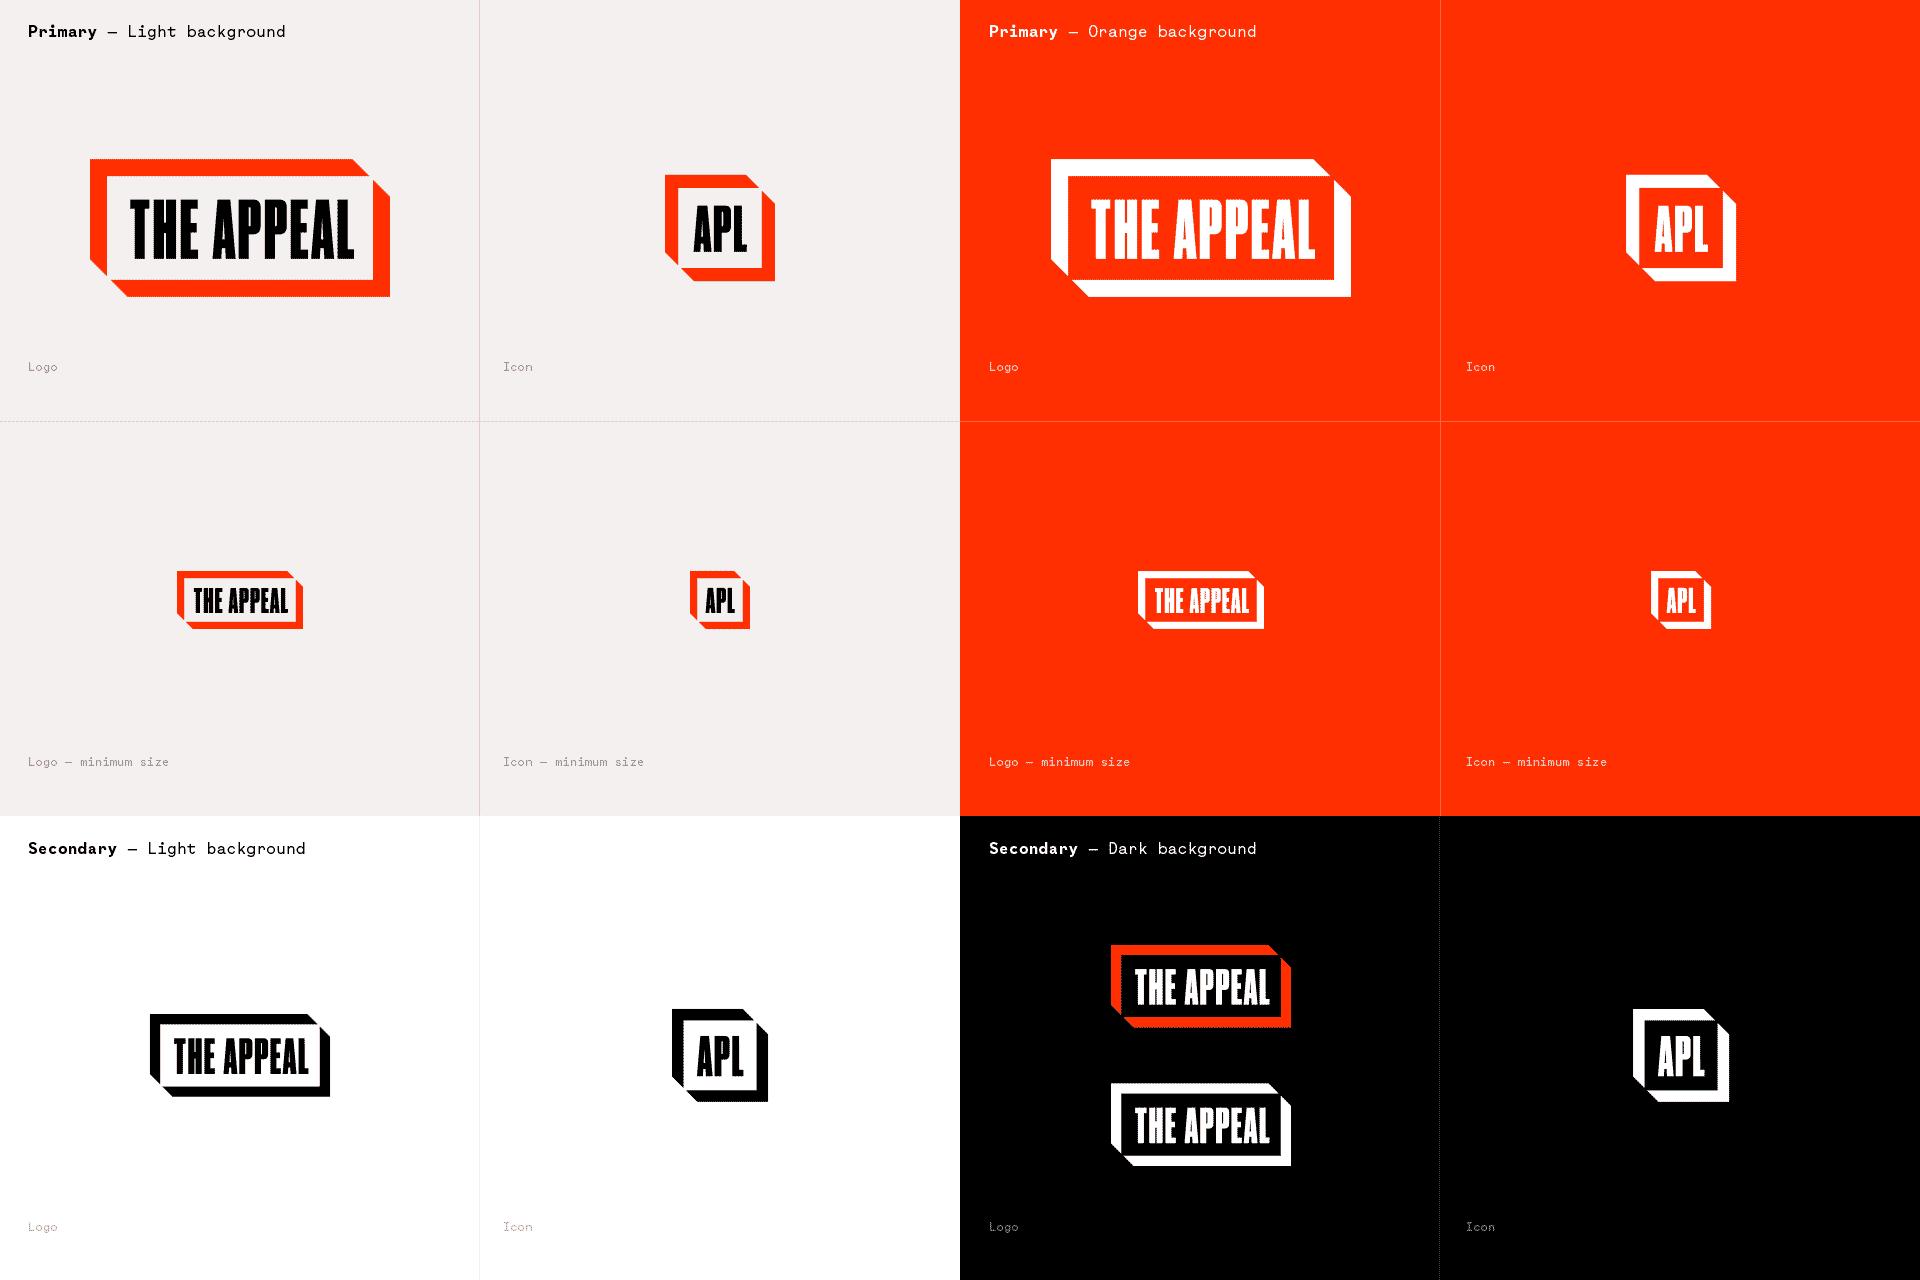 apl-logo-overview